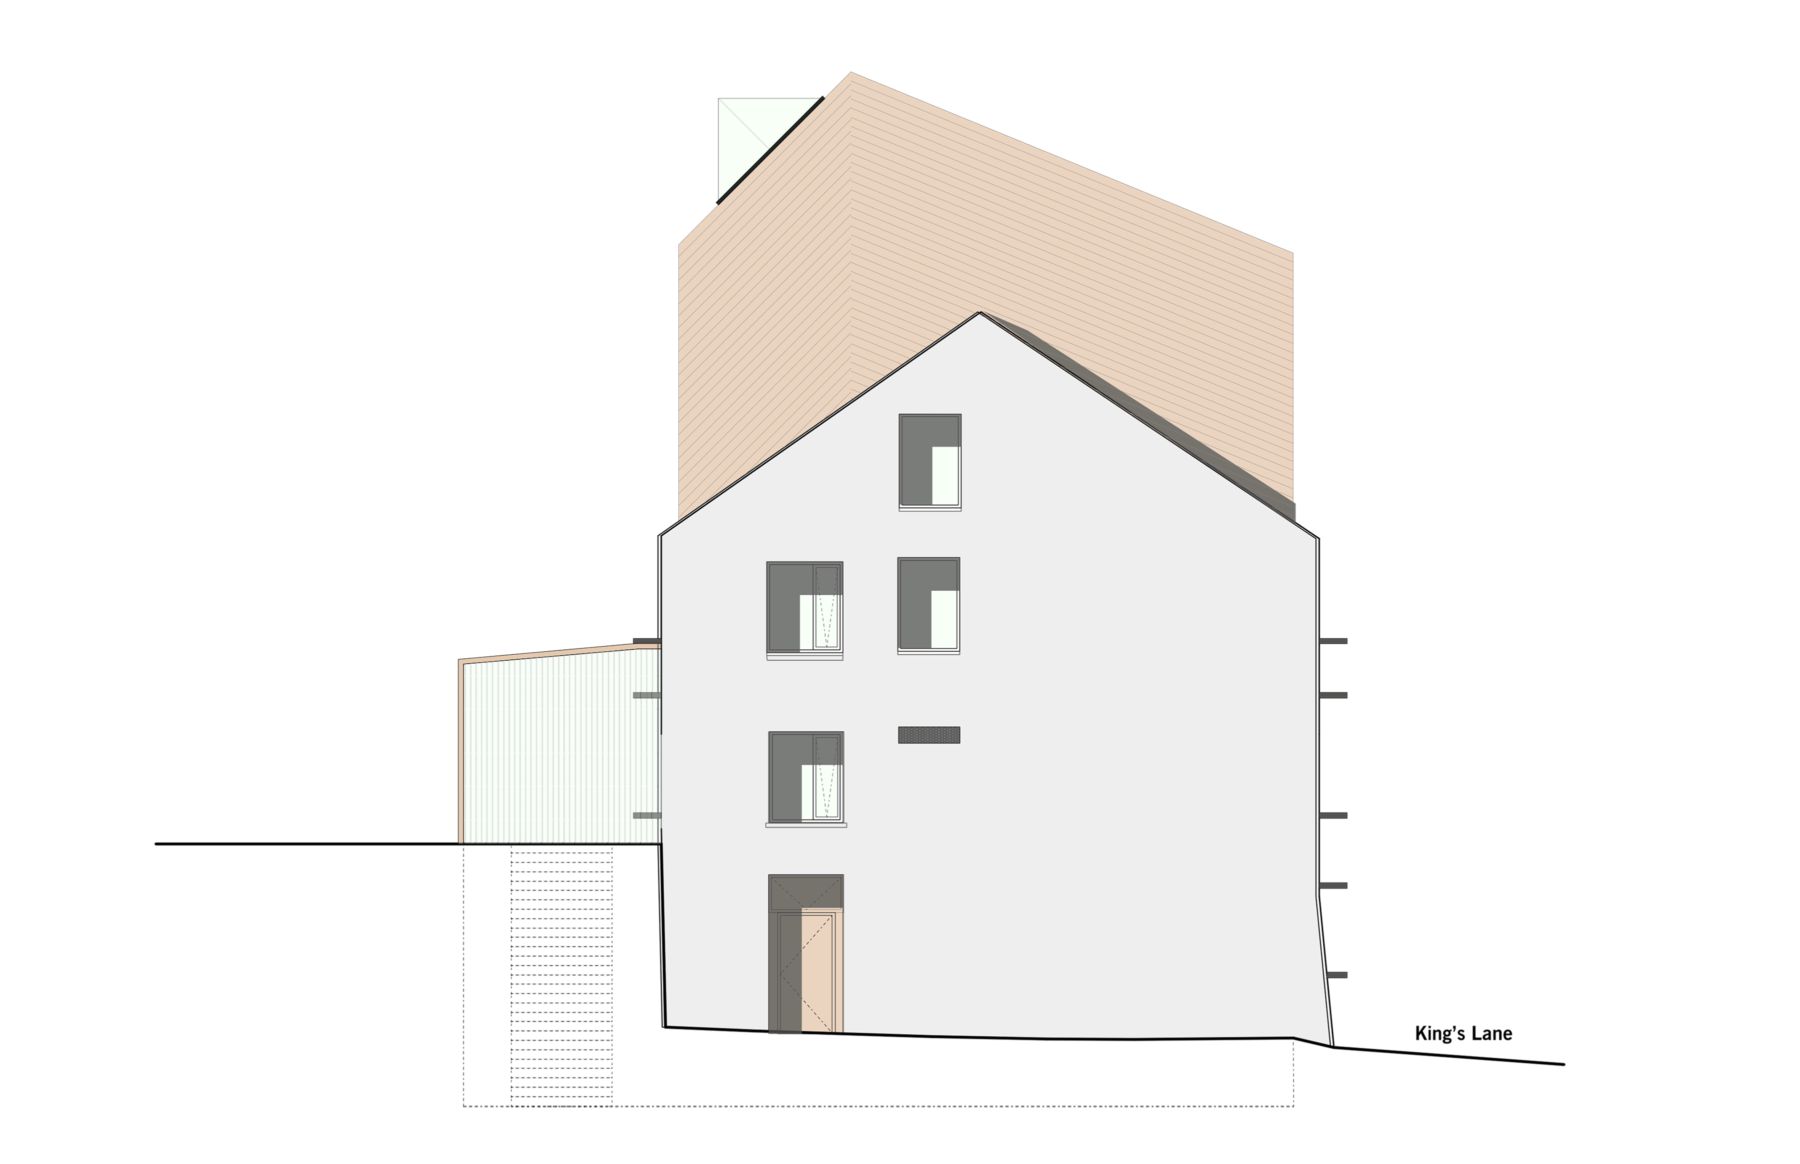 Sarah-Wigglesworth-Architects Swansea-Print-Works Drawing Side-Elevation 3600